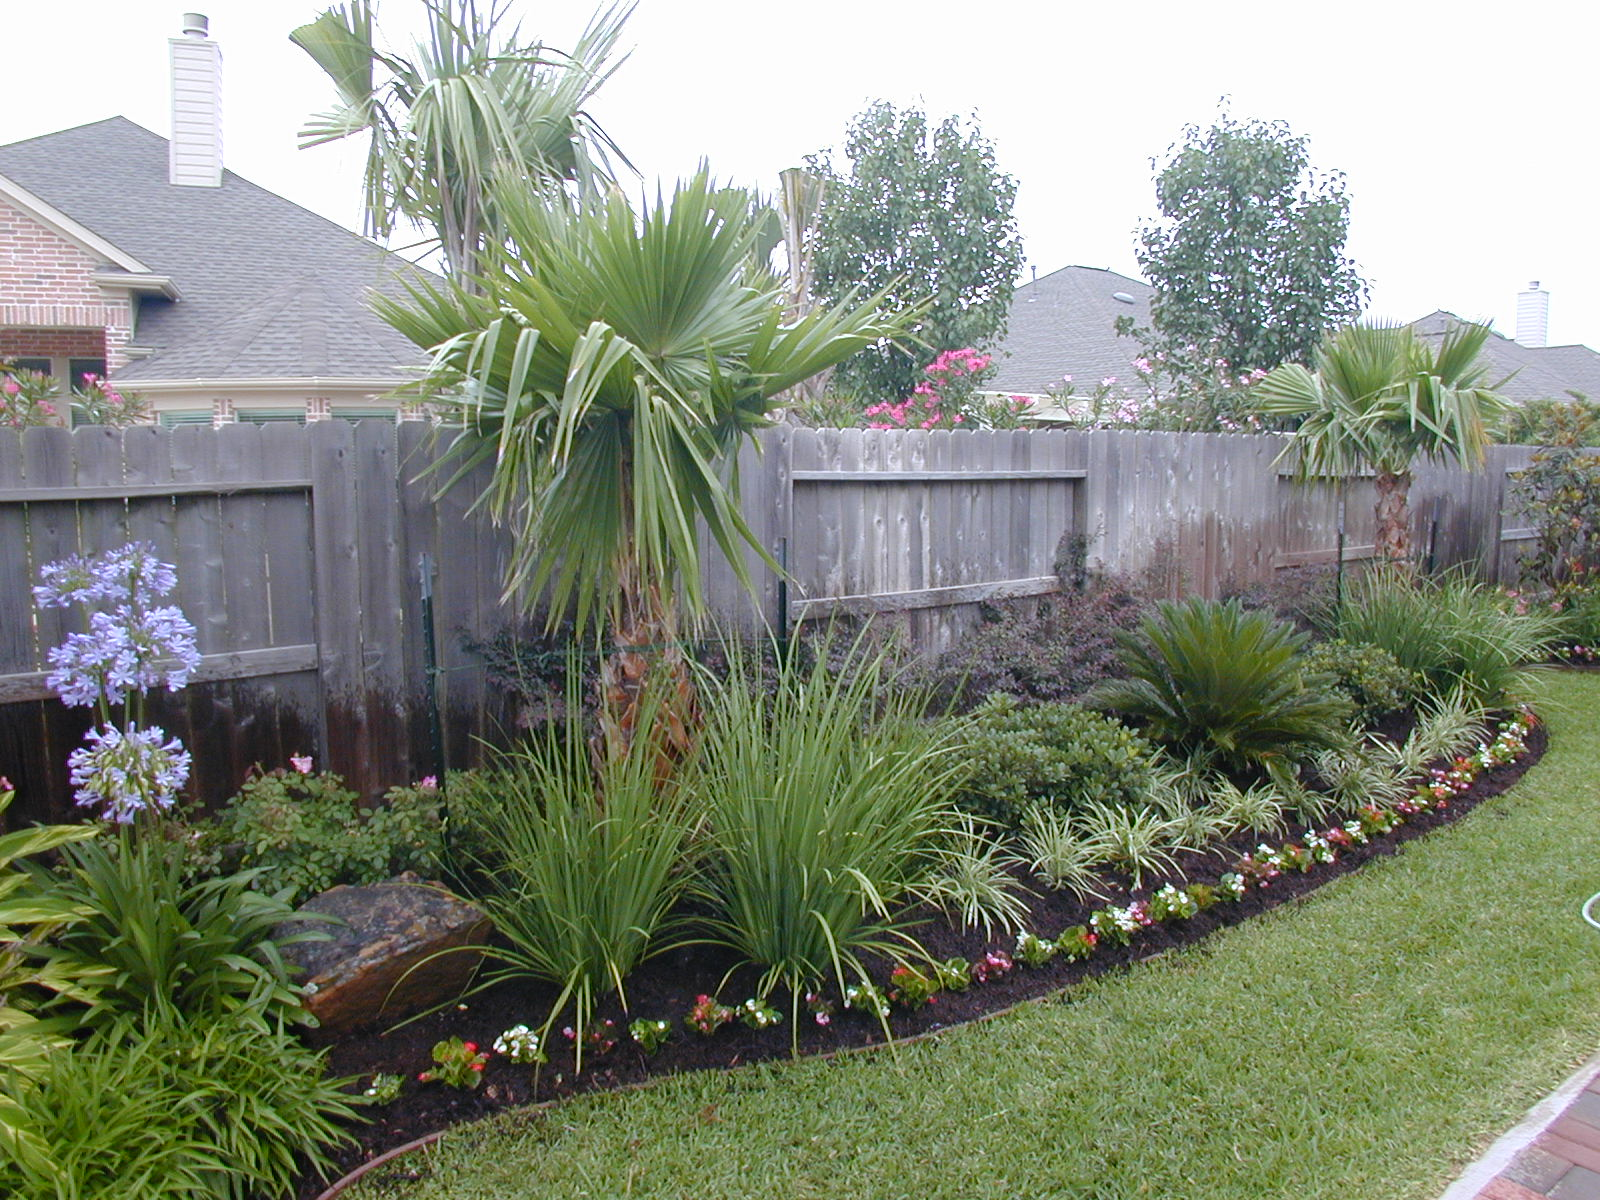 garden-landscaping-ideas-garden-landscape-landscaping-design-modern-landscape-design-house-landscape-conservative-landscape-design-ideas-for-side-of-house-landscape-design-ideas-mediterr